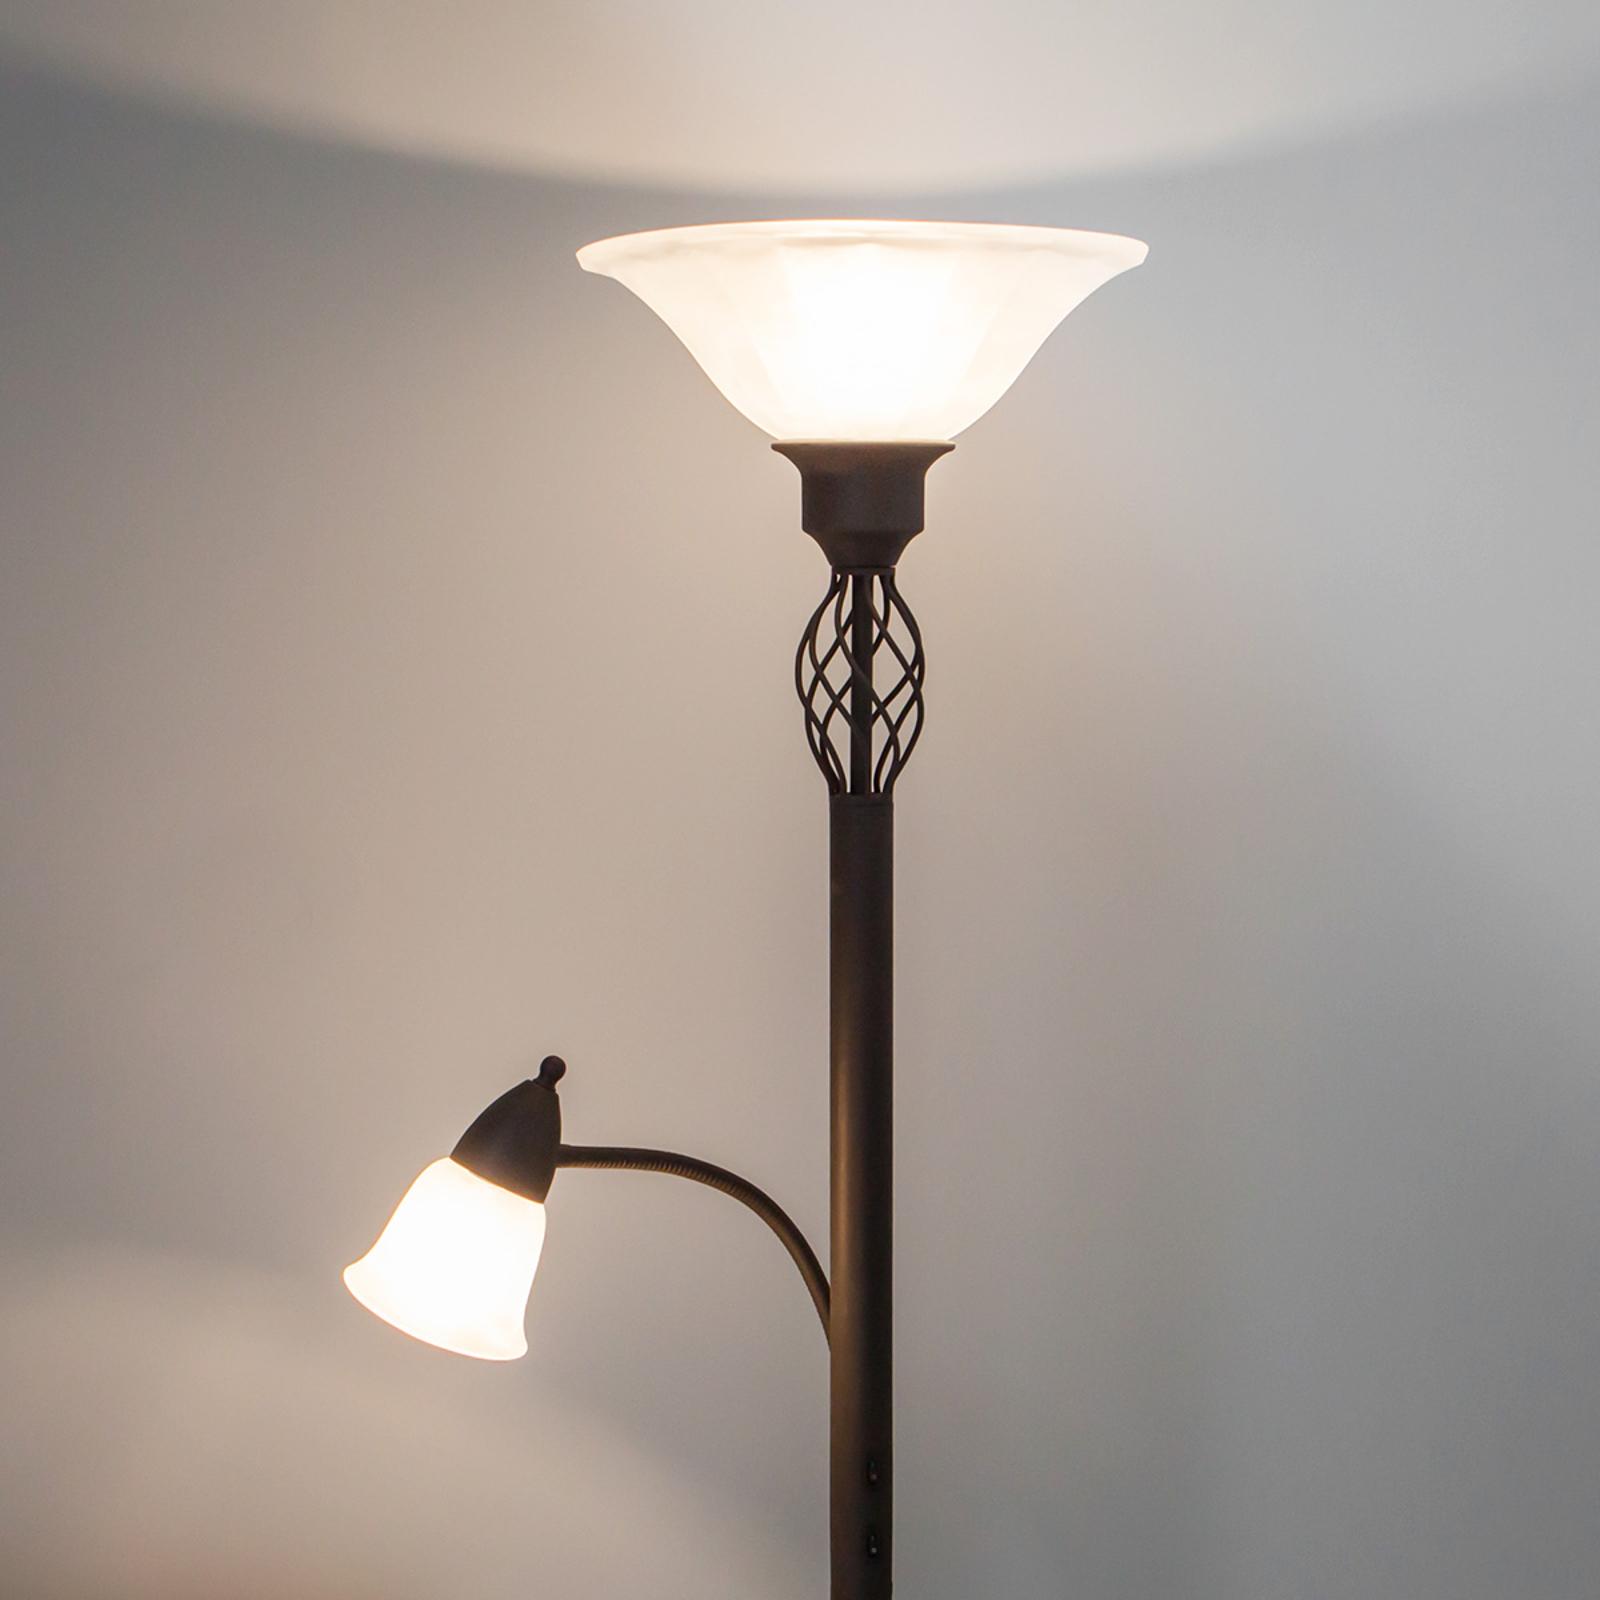 Dunja - lampada LED da terra con luce di lettura